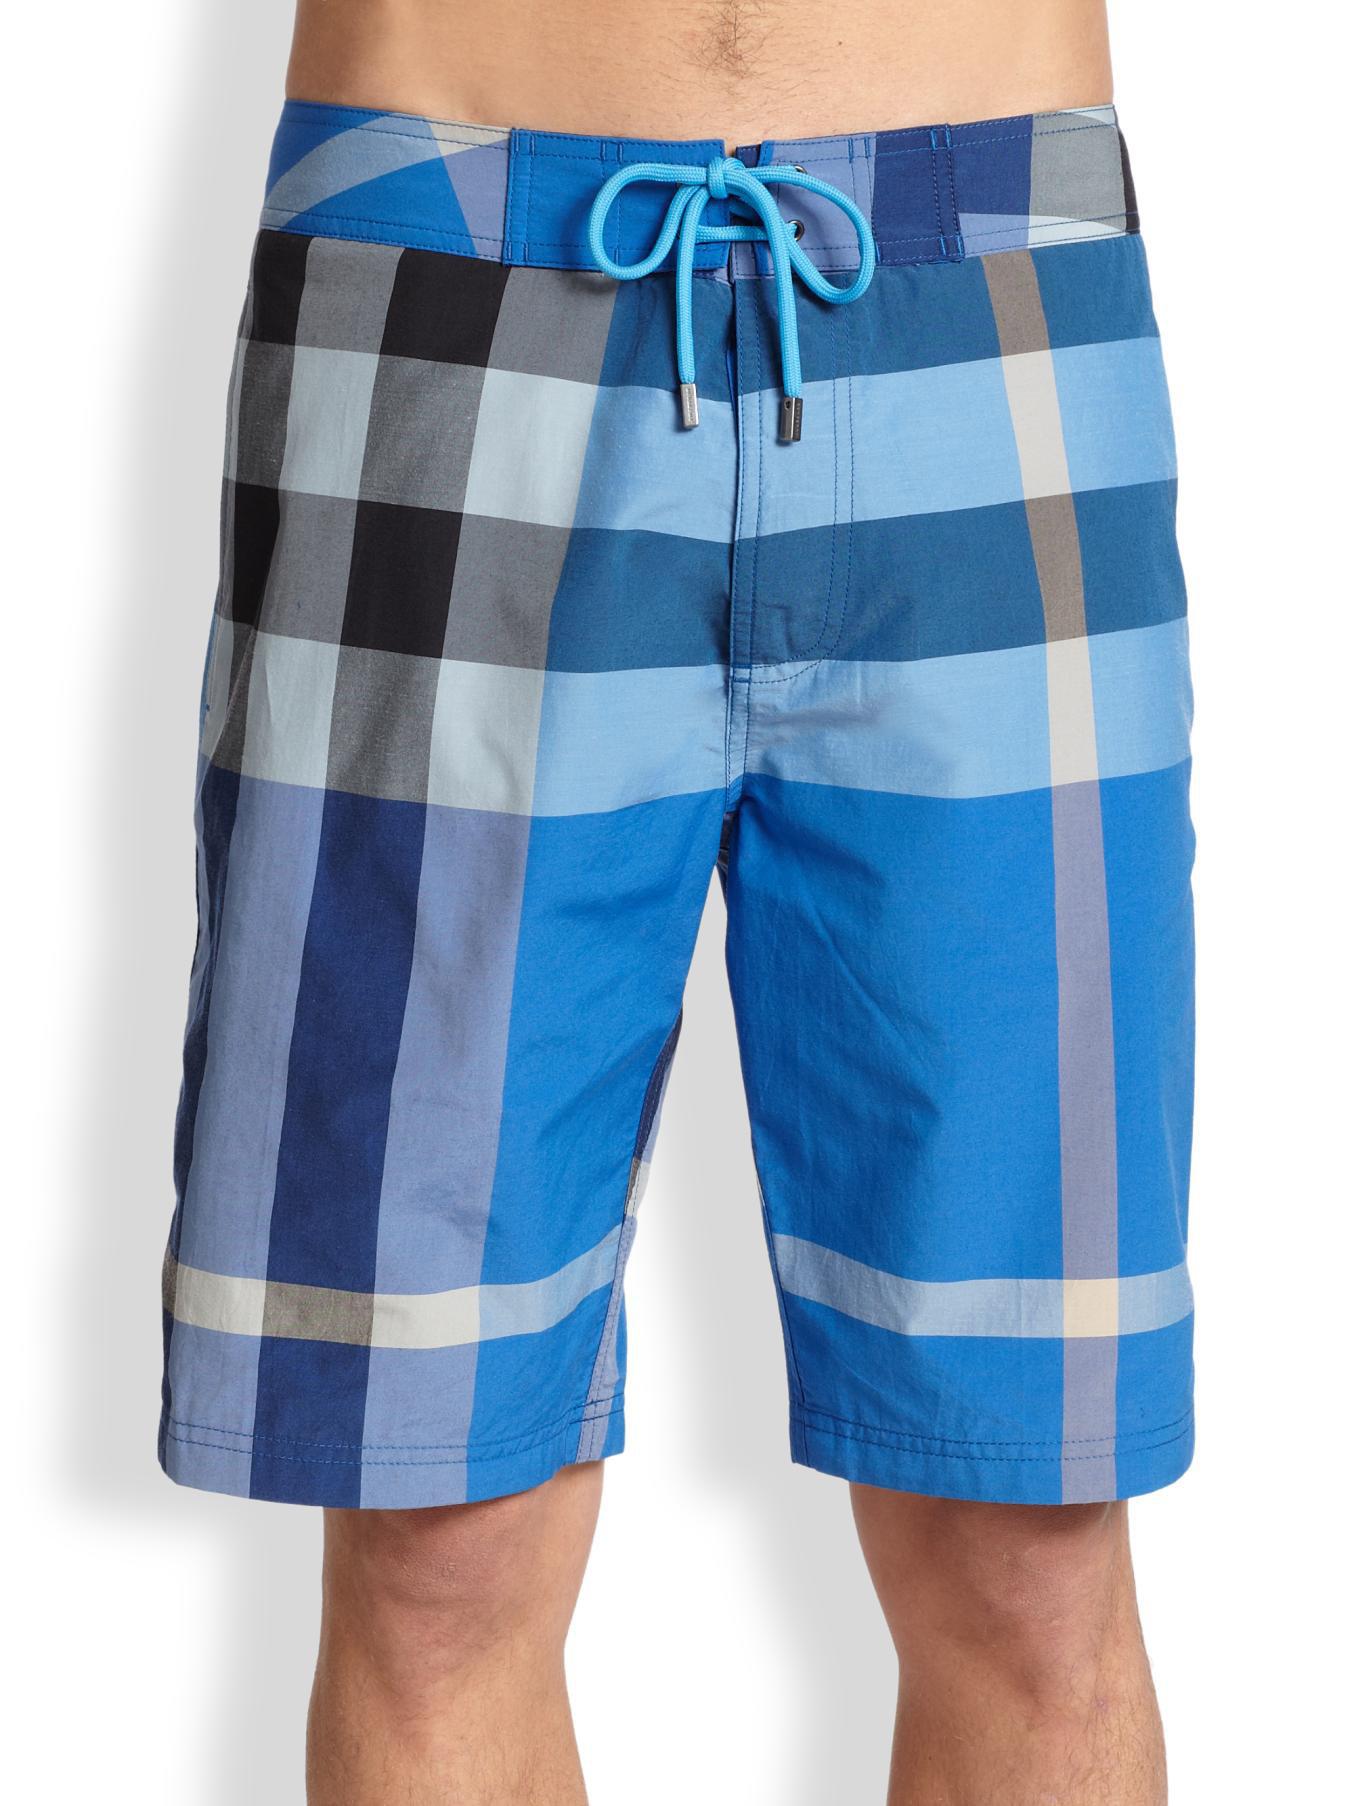 3fedcb2dd5 Burberry Brit Laguna Check Swim Trunks in Blue for Men - Lyst